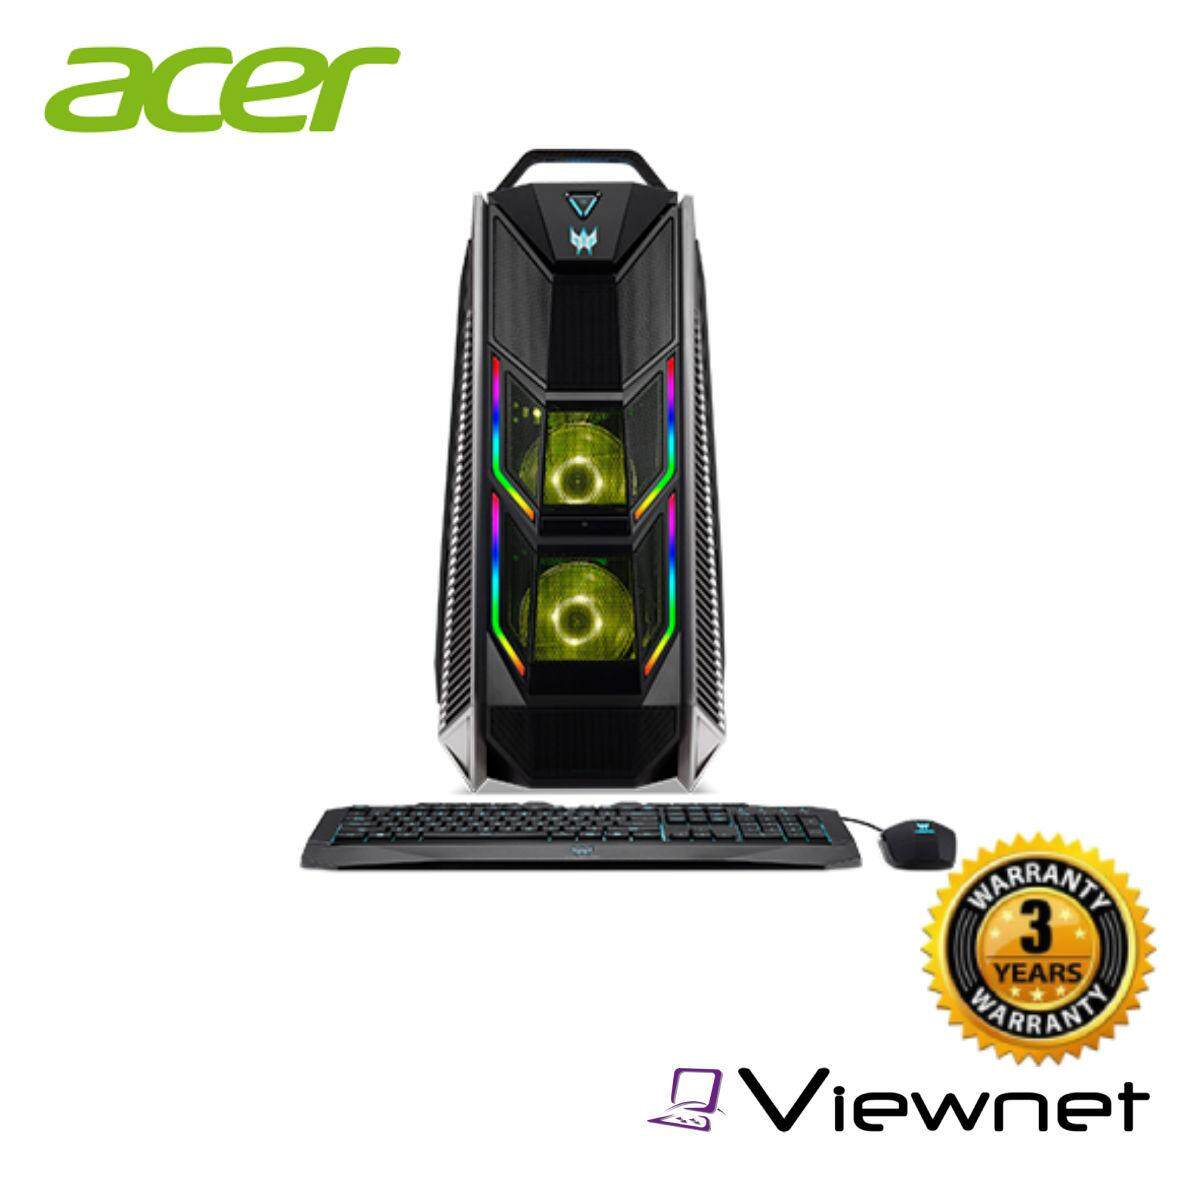 Acer Predator Orion 9000 Desktop With Free Predator Flare Keyboard And Predator Mouse (PO9-600_RGB)